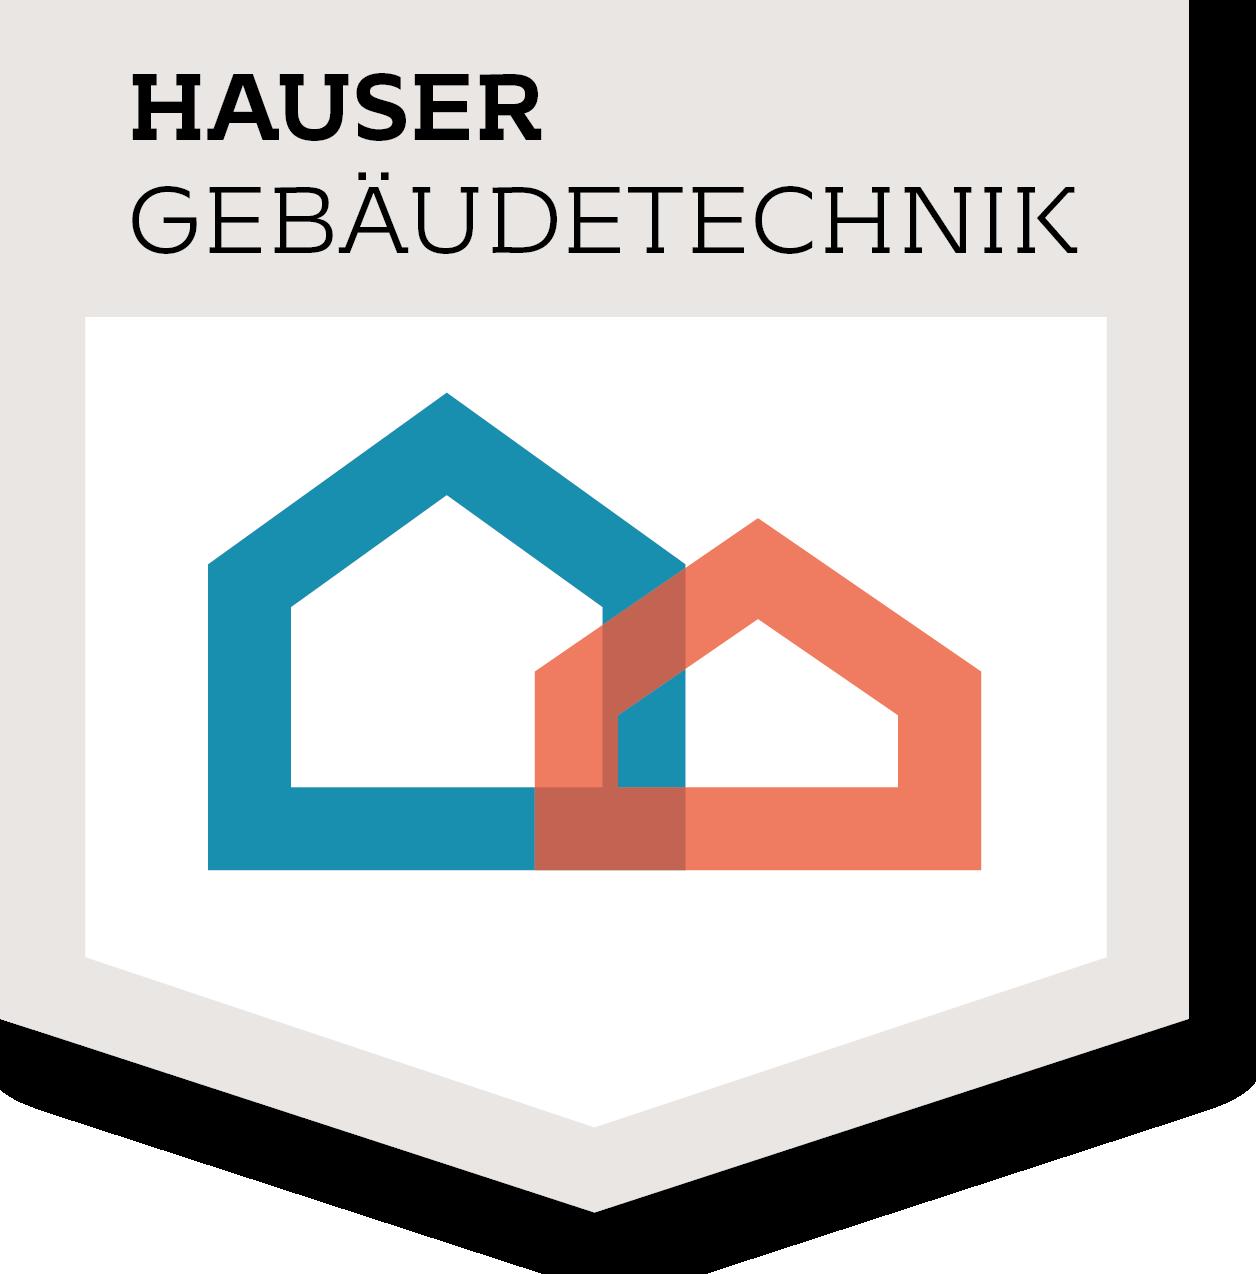 Terms & Conditions — Hauser Gebäudetechnik